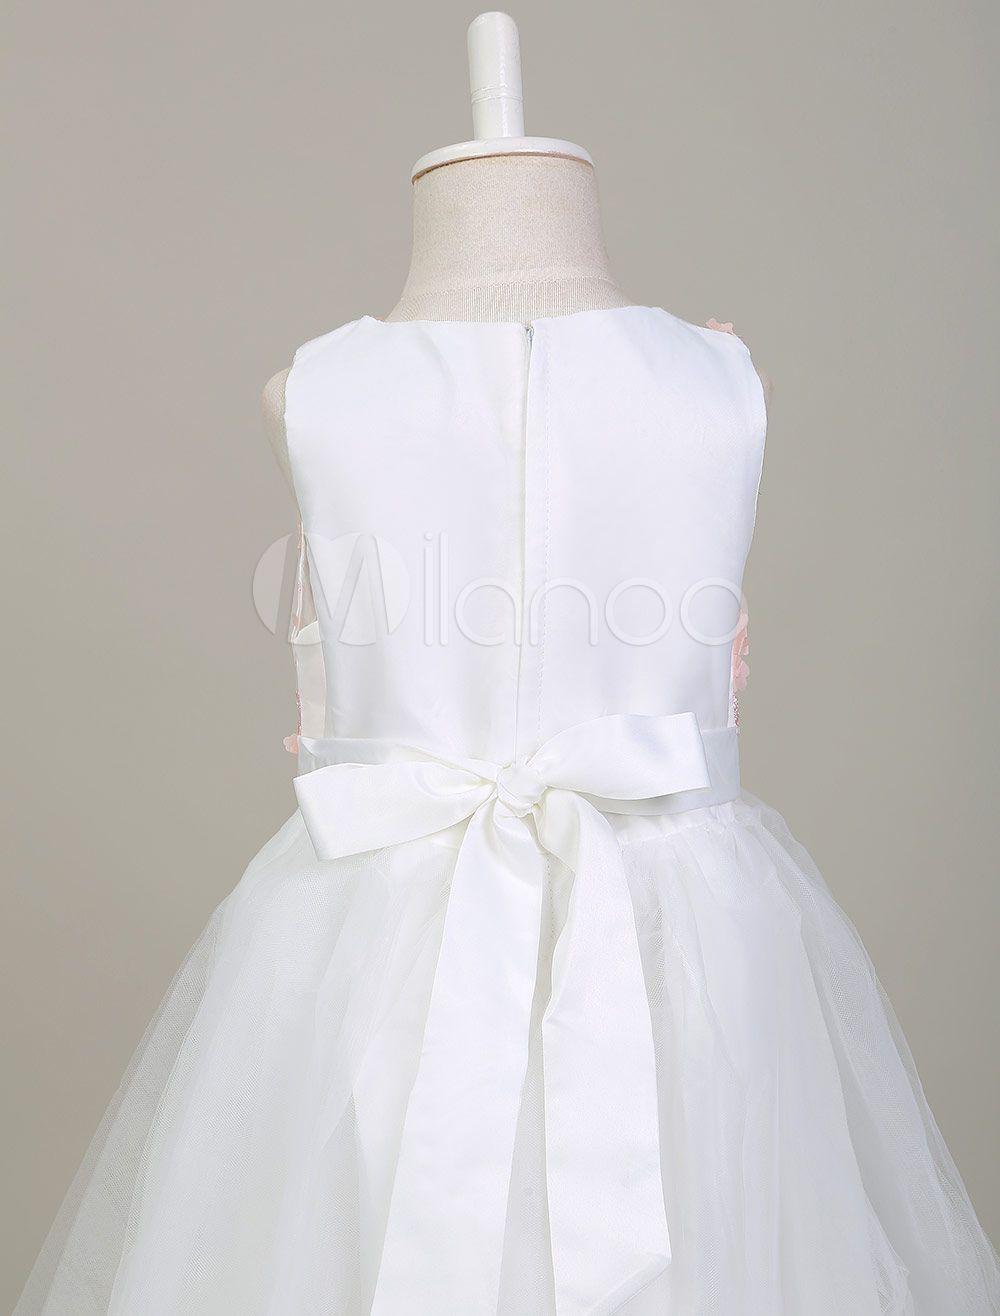 57b75d334d8 Flower Girl Dresses White Round Neck Sleeveless Princess Tutu Dress Tulle  Applique Floor Length Kids  Pageant Dress  Neck